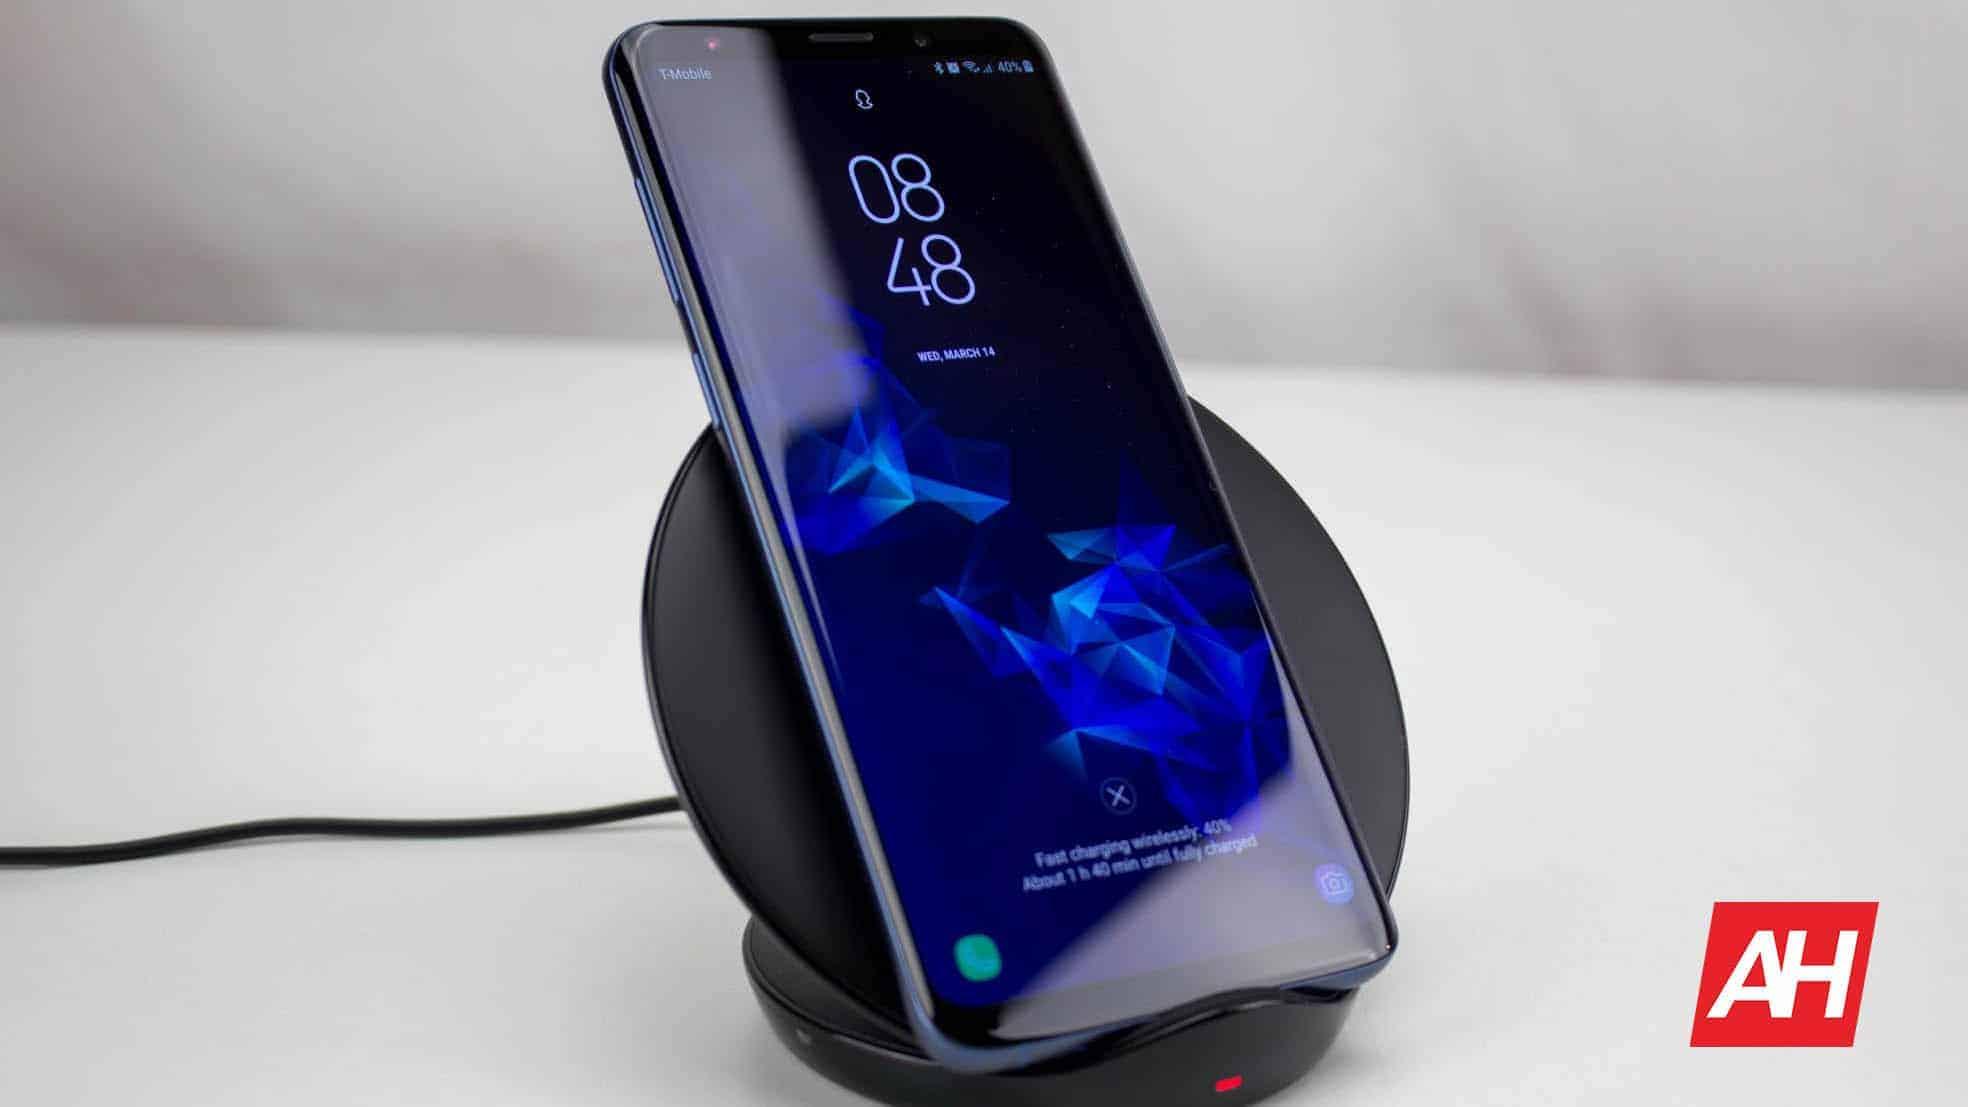 Samsung Galaxy S9 Plus AH NS wireless charging 1new